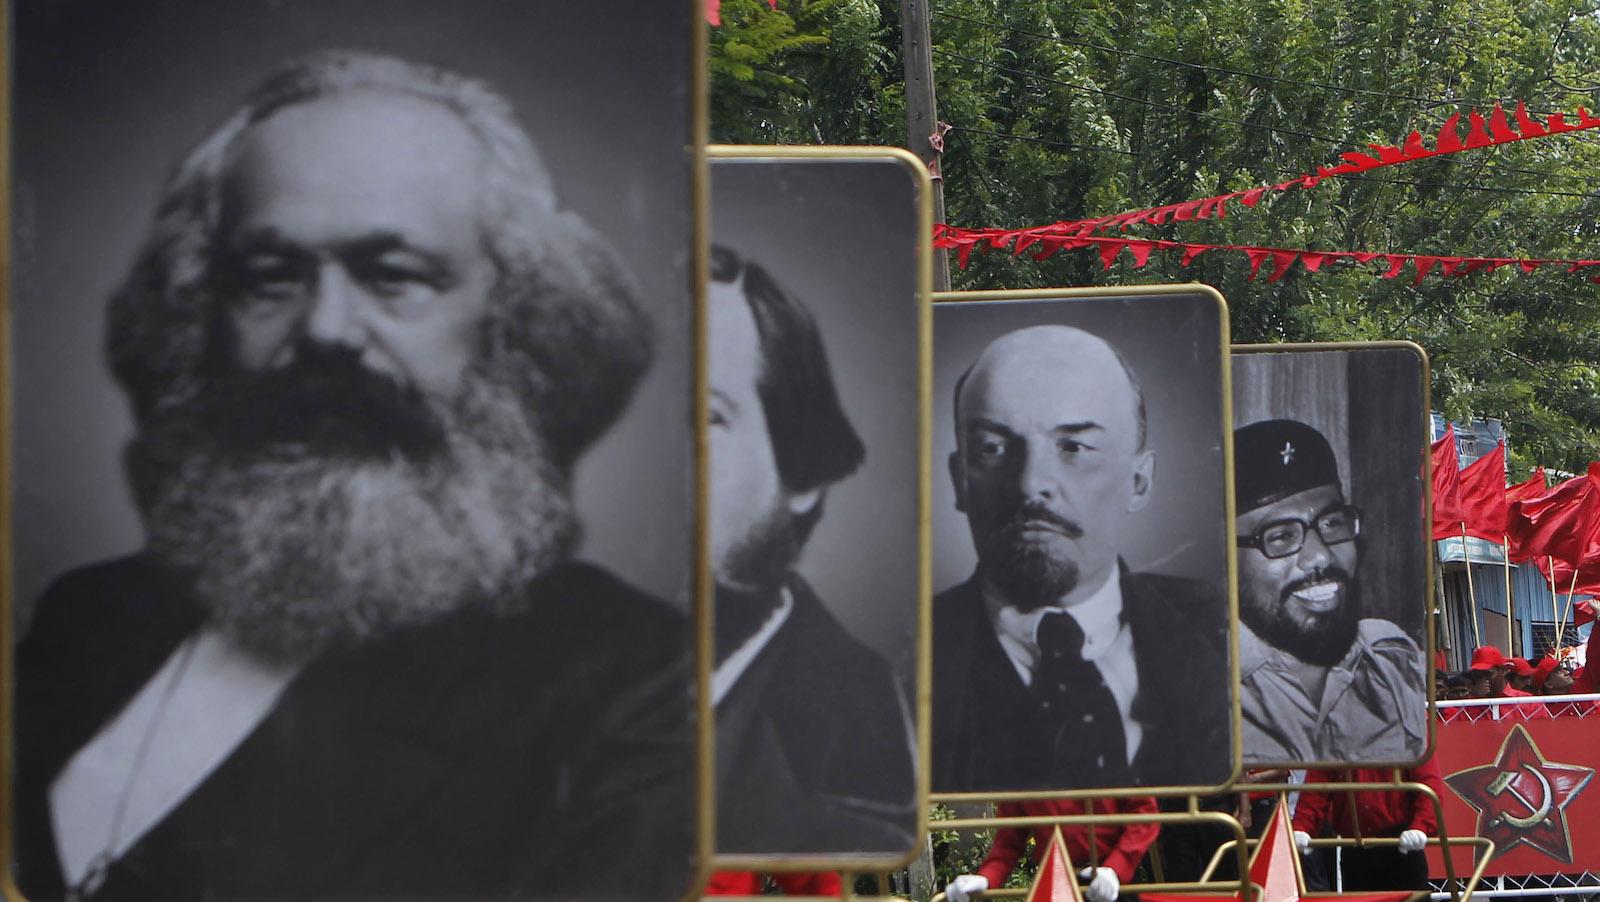 Karl Marx, Friedrich Engels, Vladimir Lenin, and Rohana Wijeweera